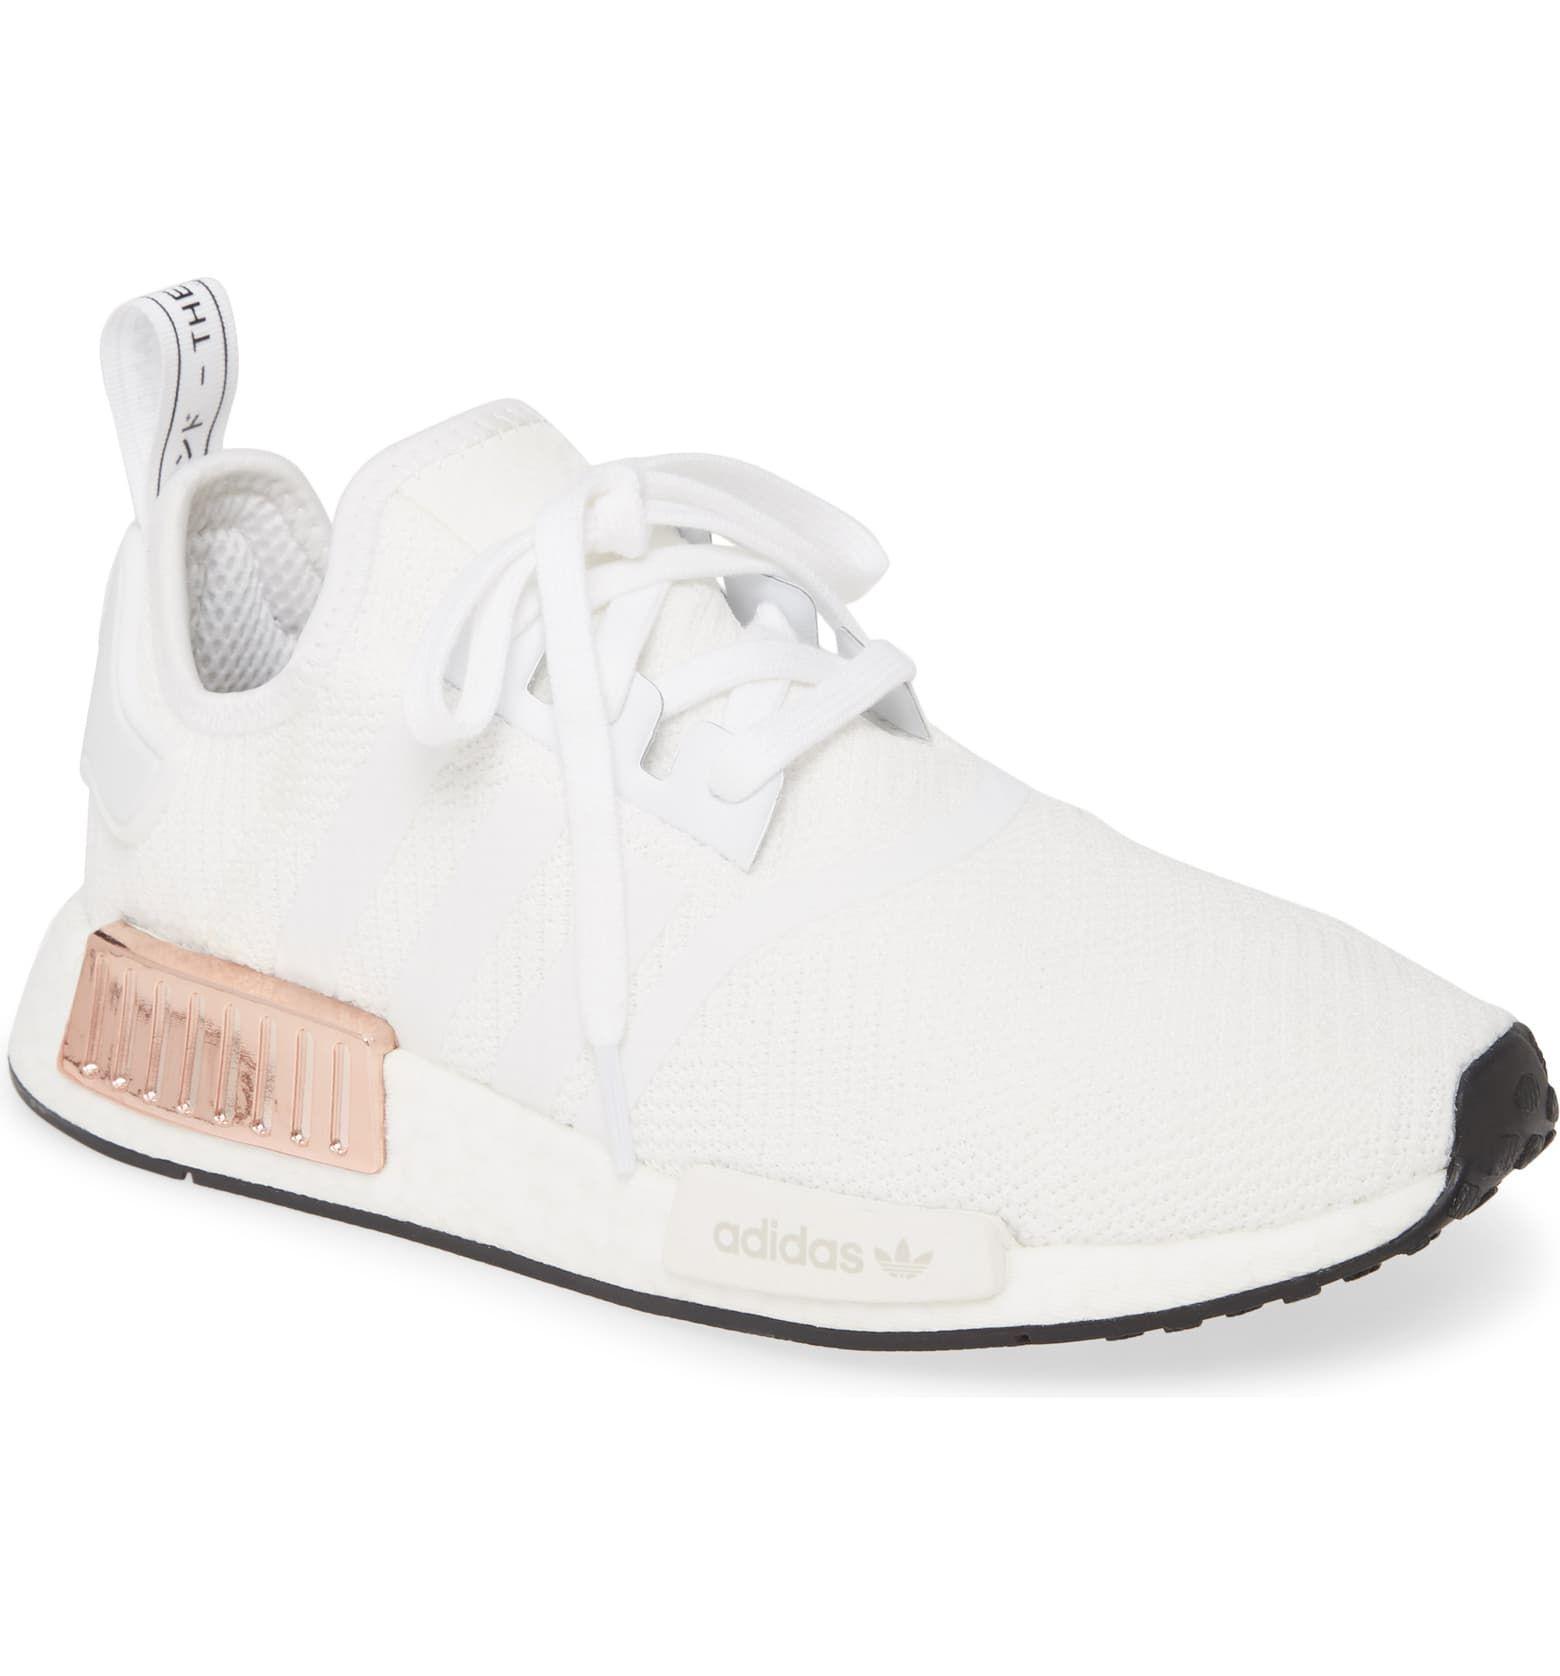 adidas NMD R1 Athletic Shoe (Women